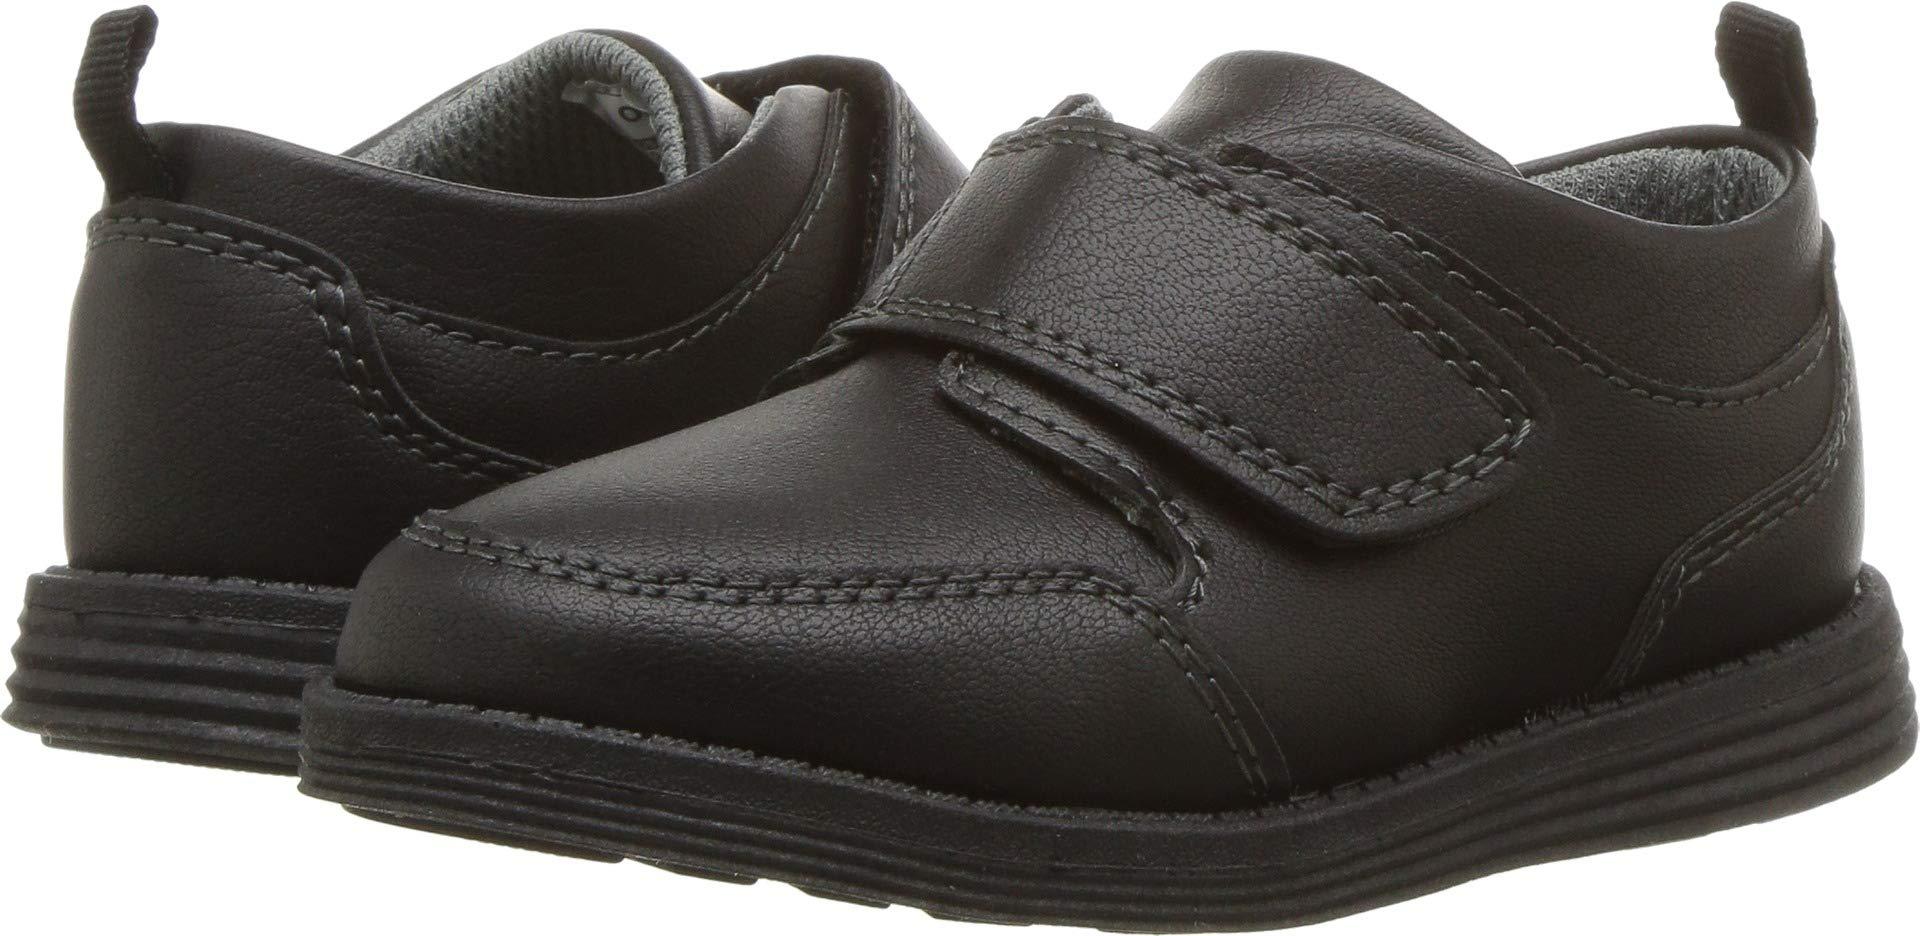 OshKosh B'Gosh Boys' Boas Uniform Dress Shoe, Black, 5 M US Toddler